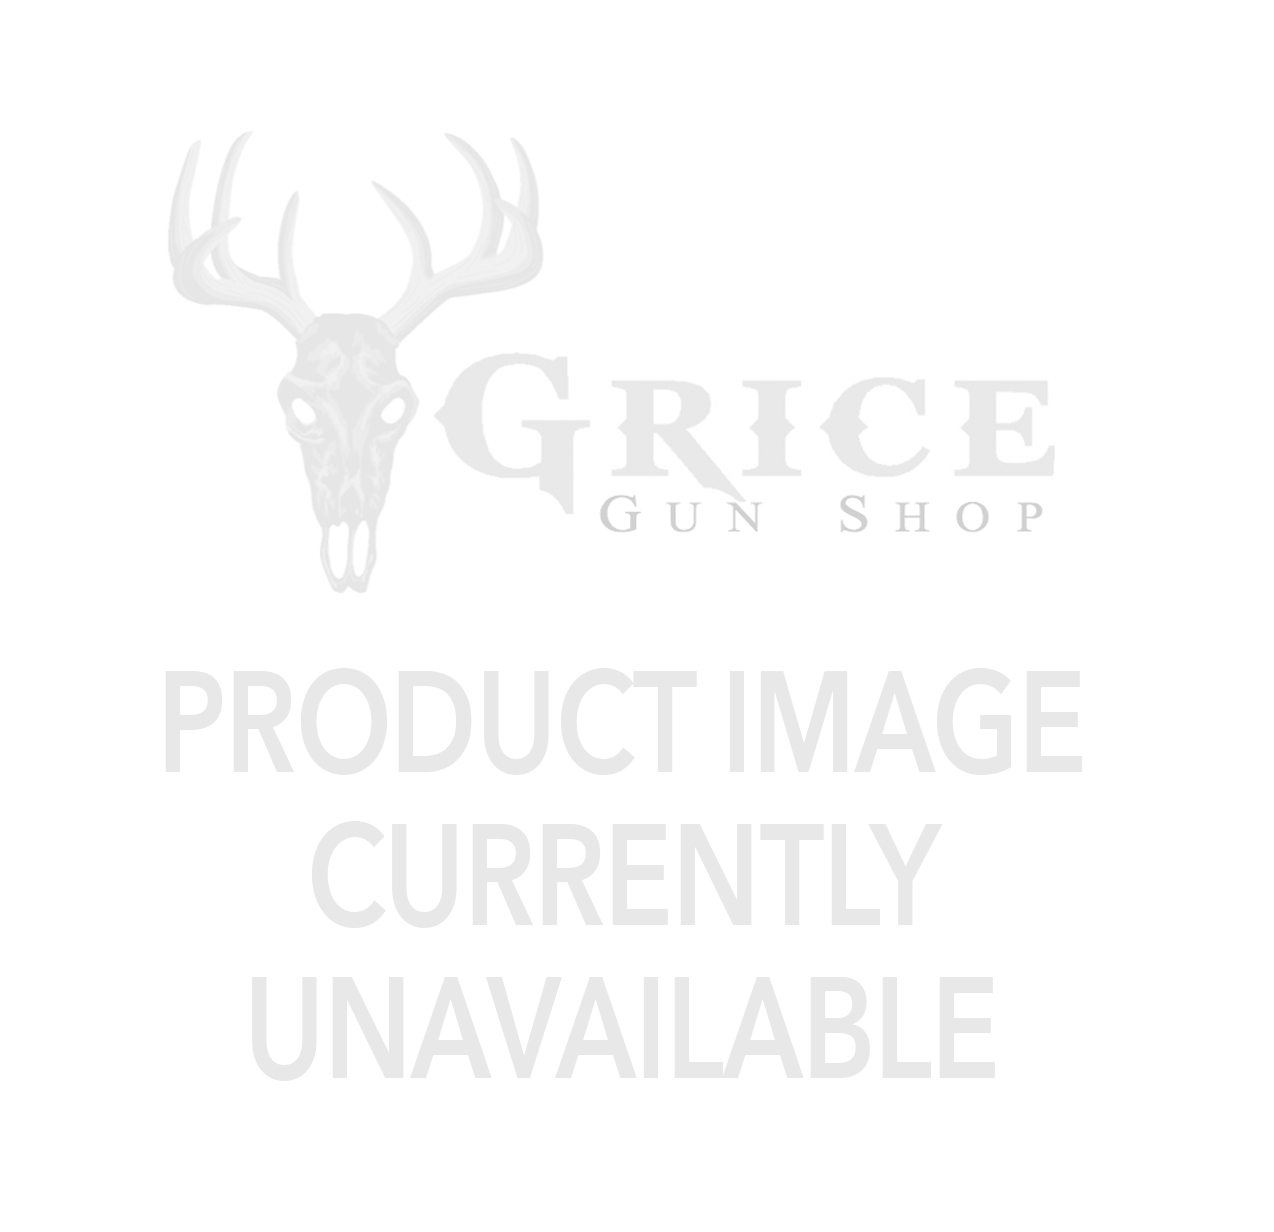 "Winchester - USA Super Target 12ga 2.75"" 8 Shot (1 1/8oz)"